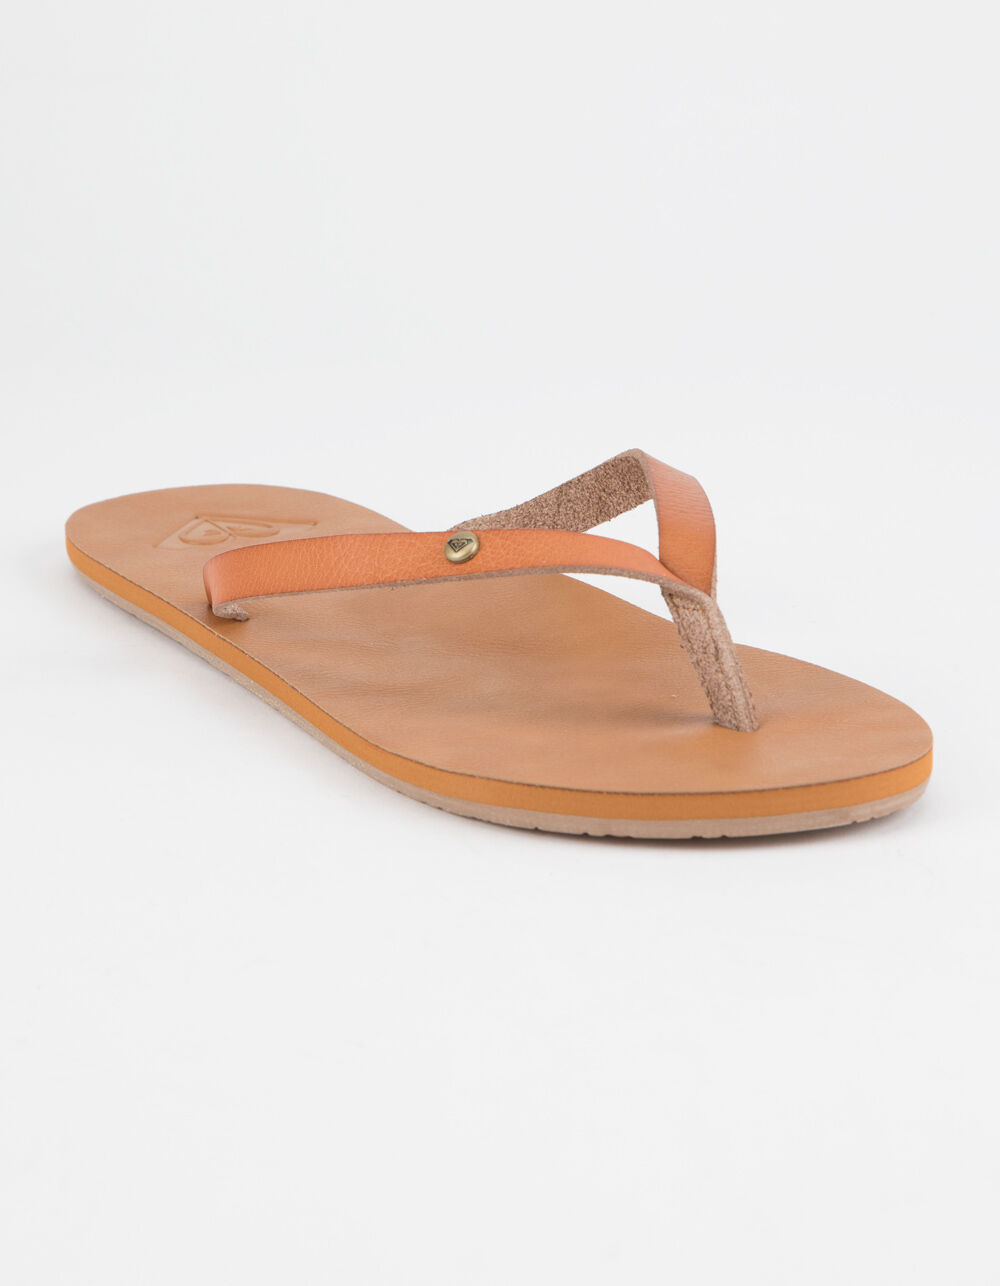 ROXY Jyll II Tan Sandals